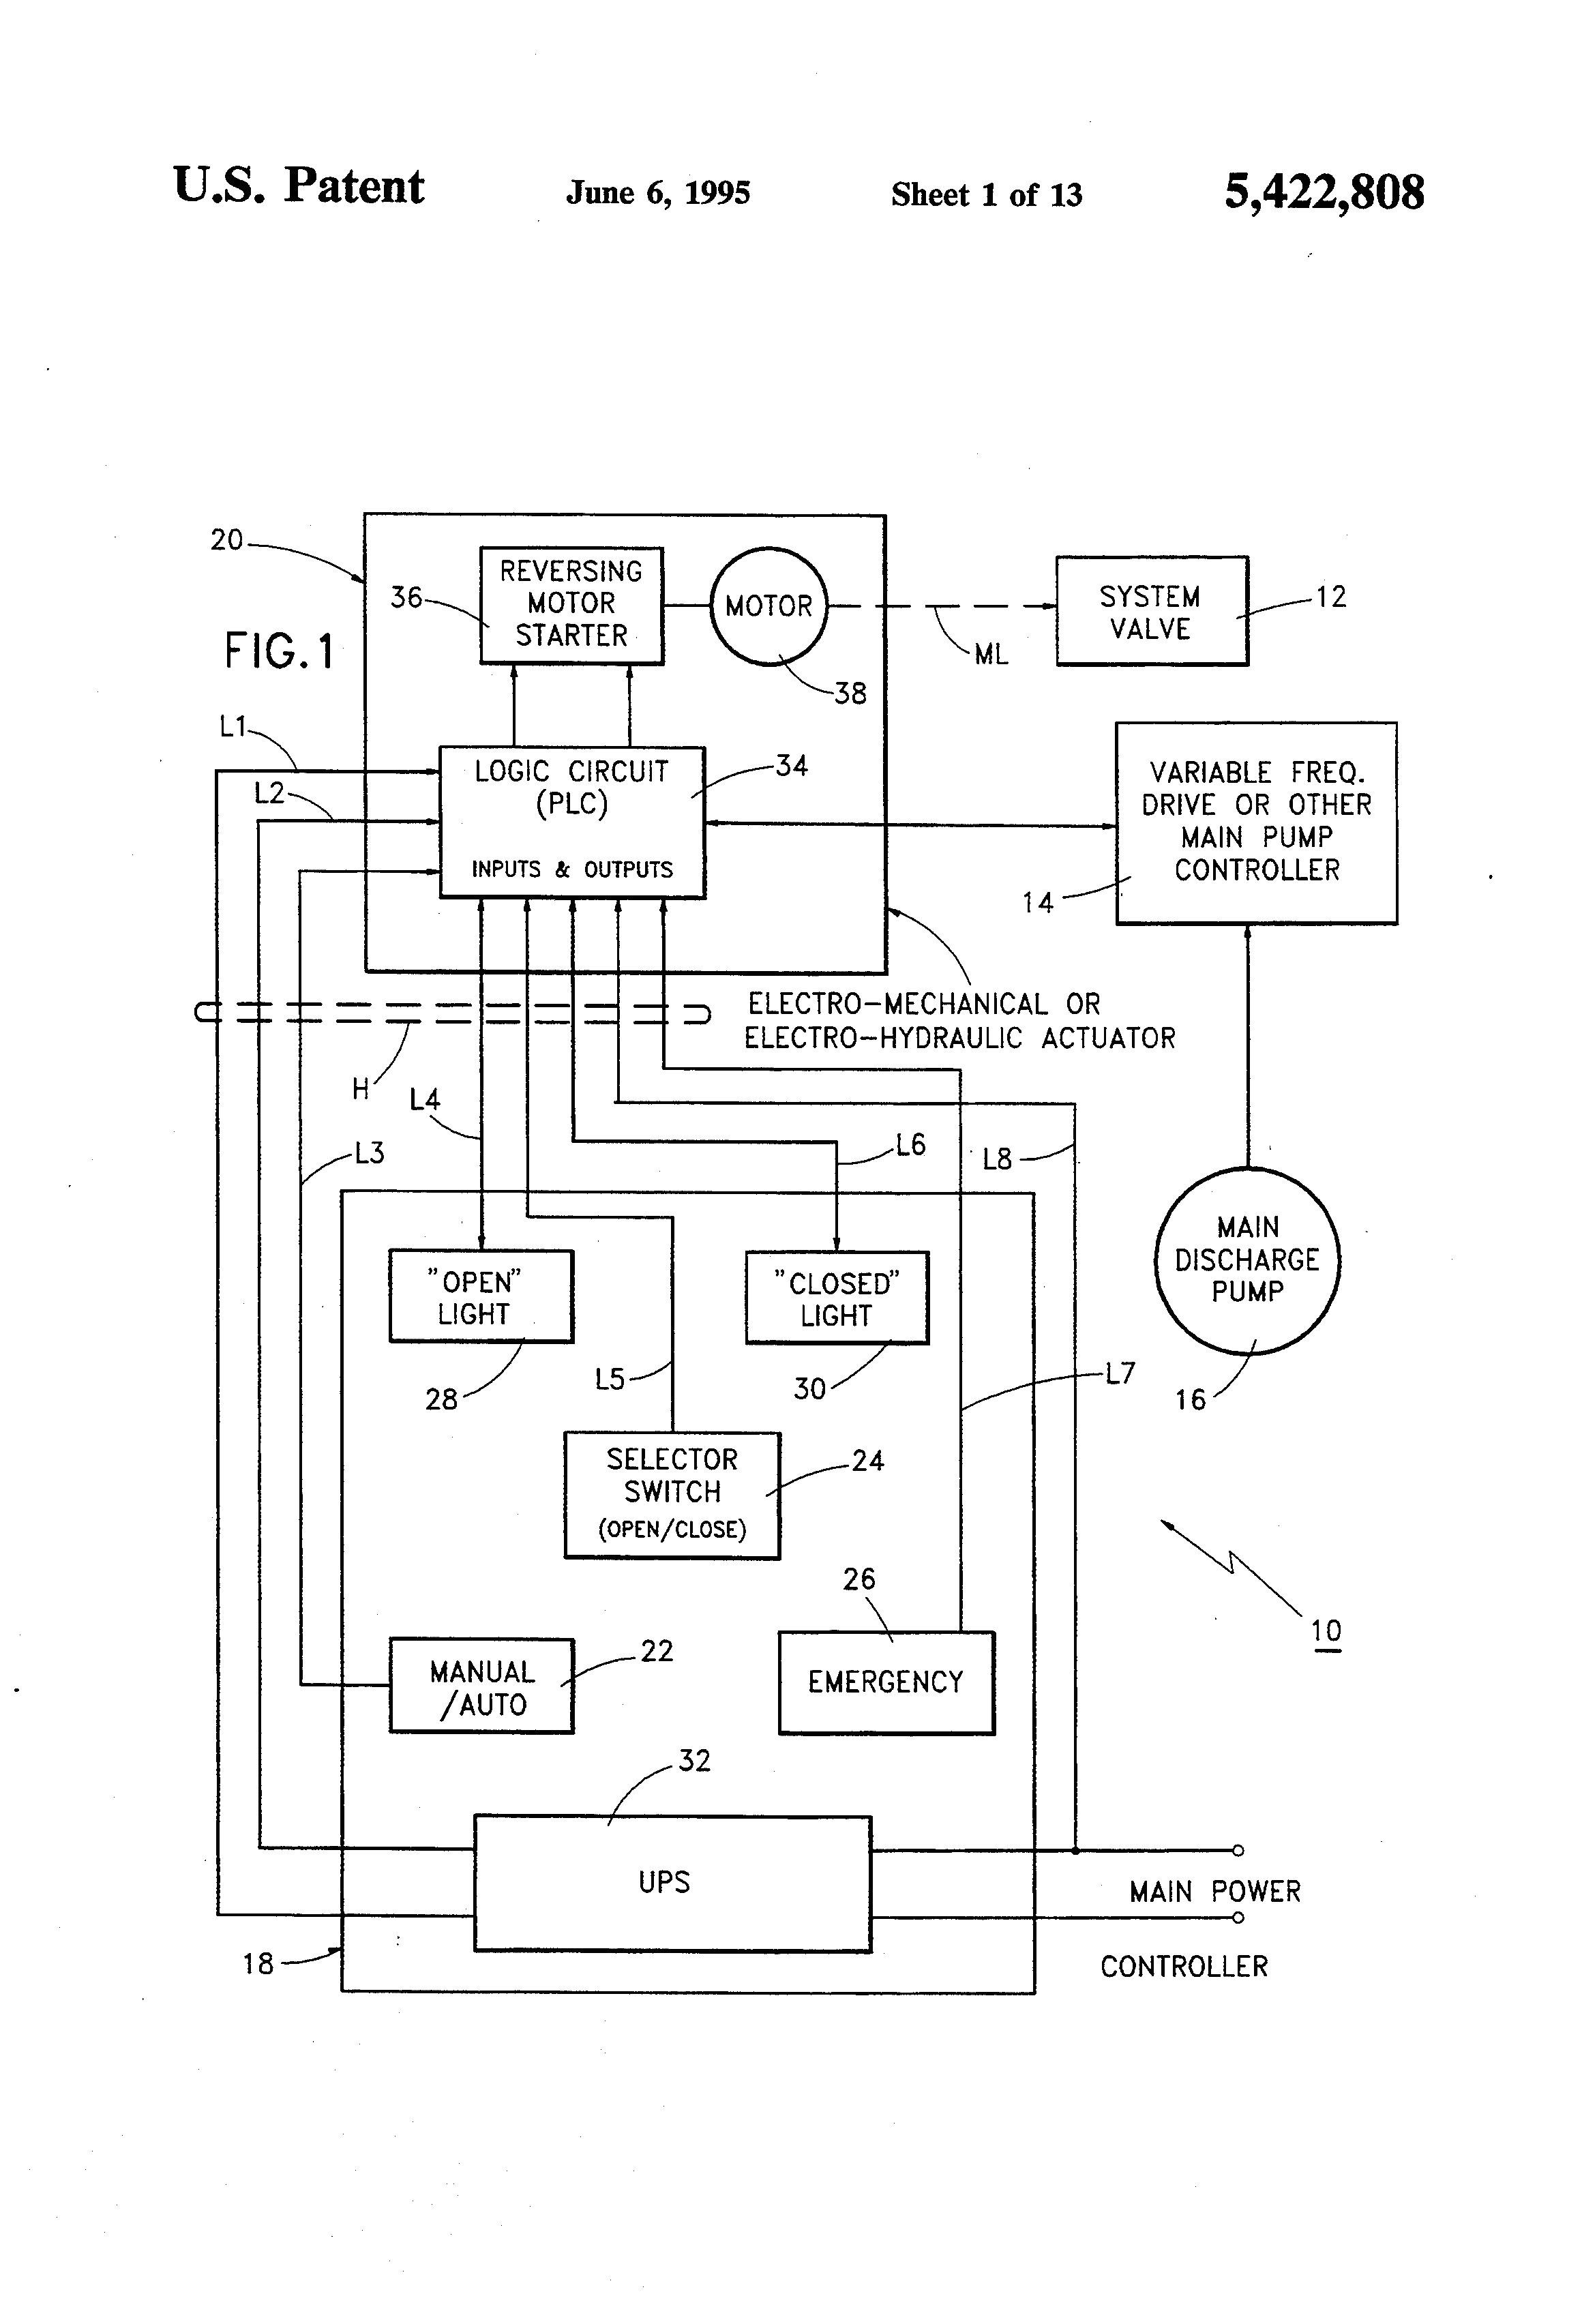 omron 61f g ap wiring diagram awesome wiring diagram wlc omron wiring diagram amp fuse